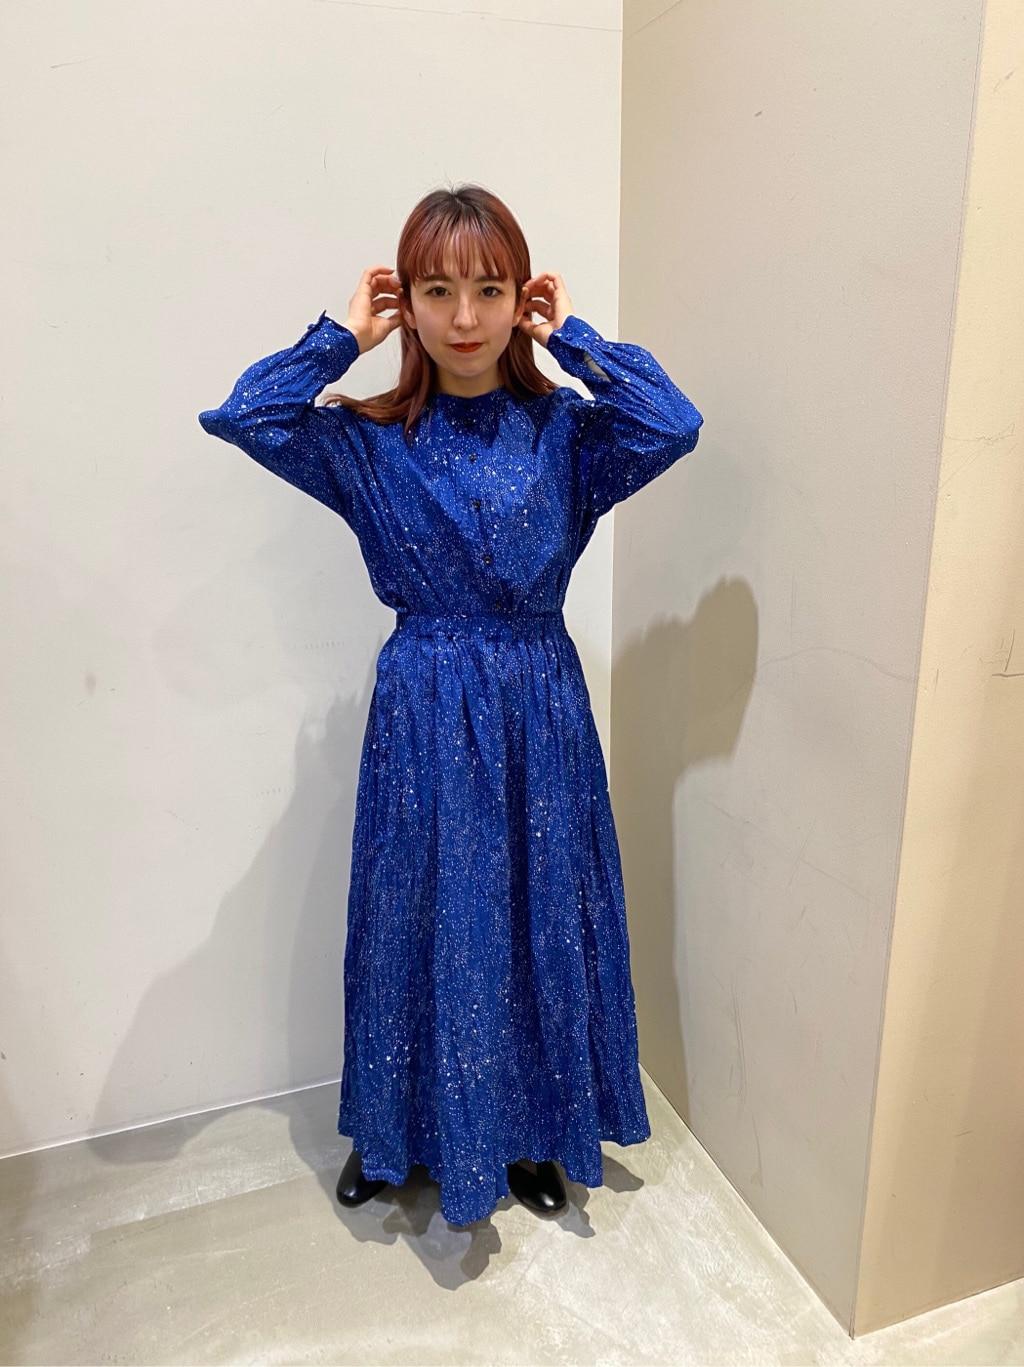 bulle de savon 阪急西宮ガーデンズ 身長:150cm 2021.01.21